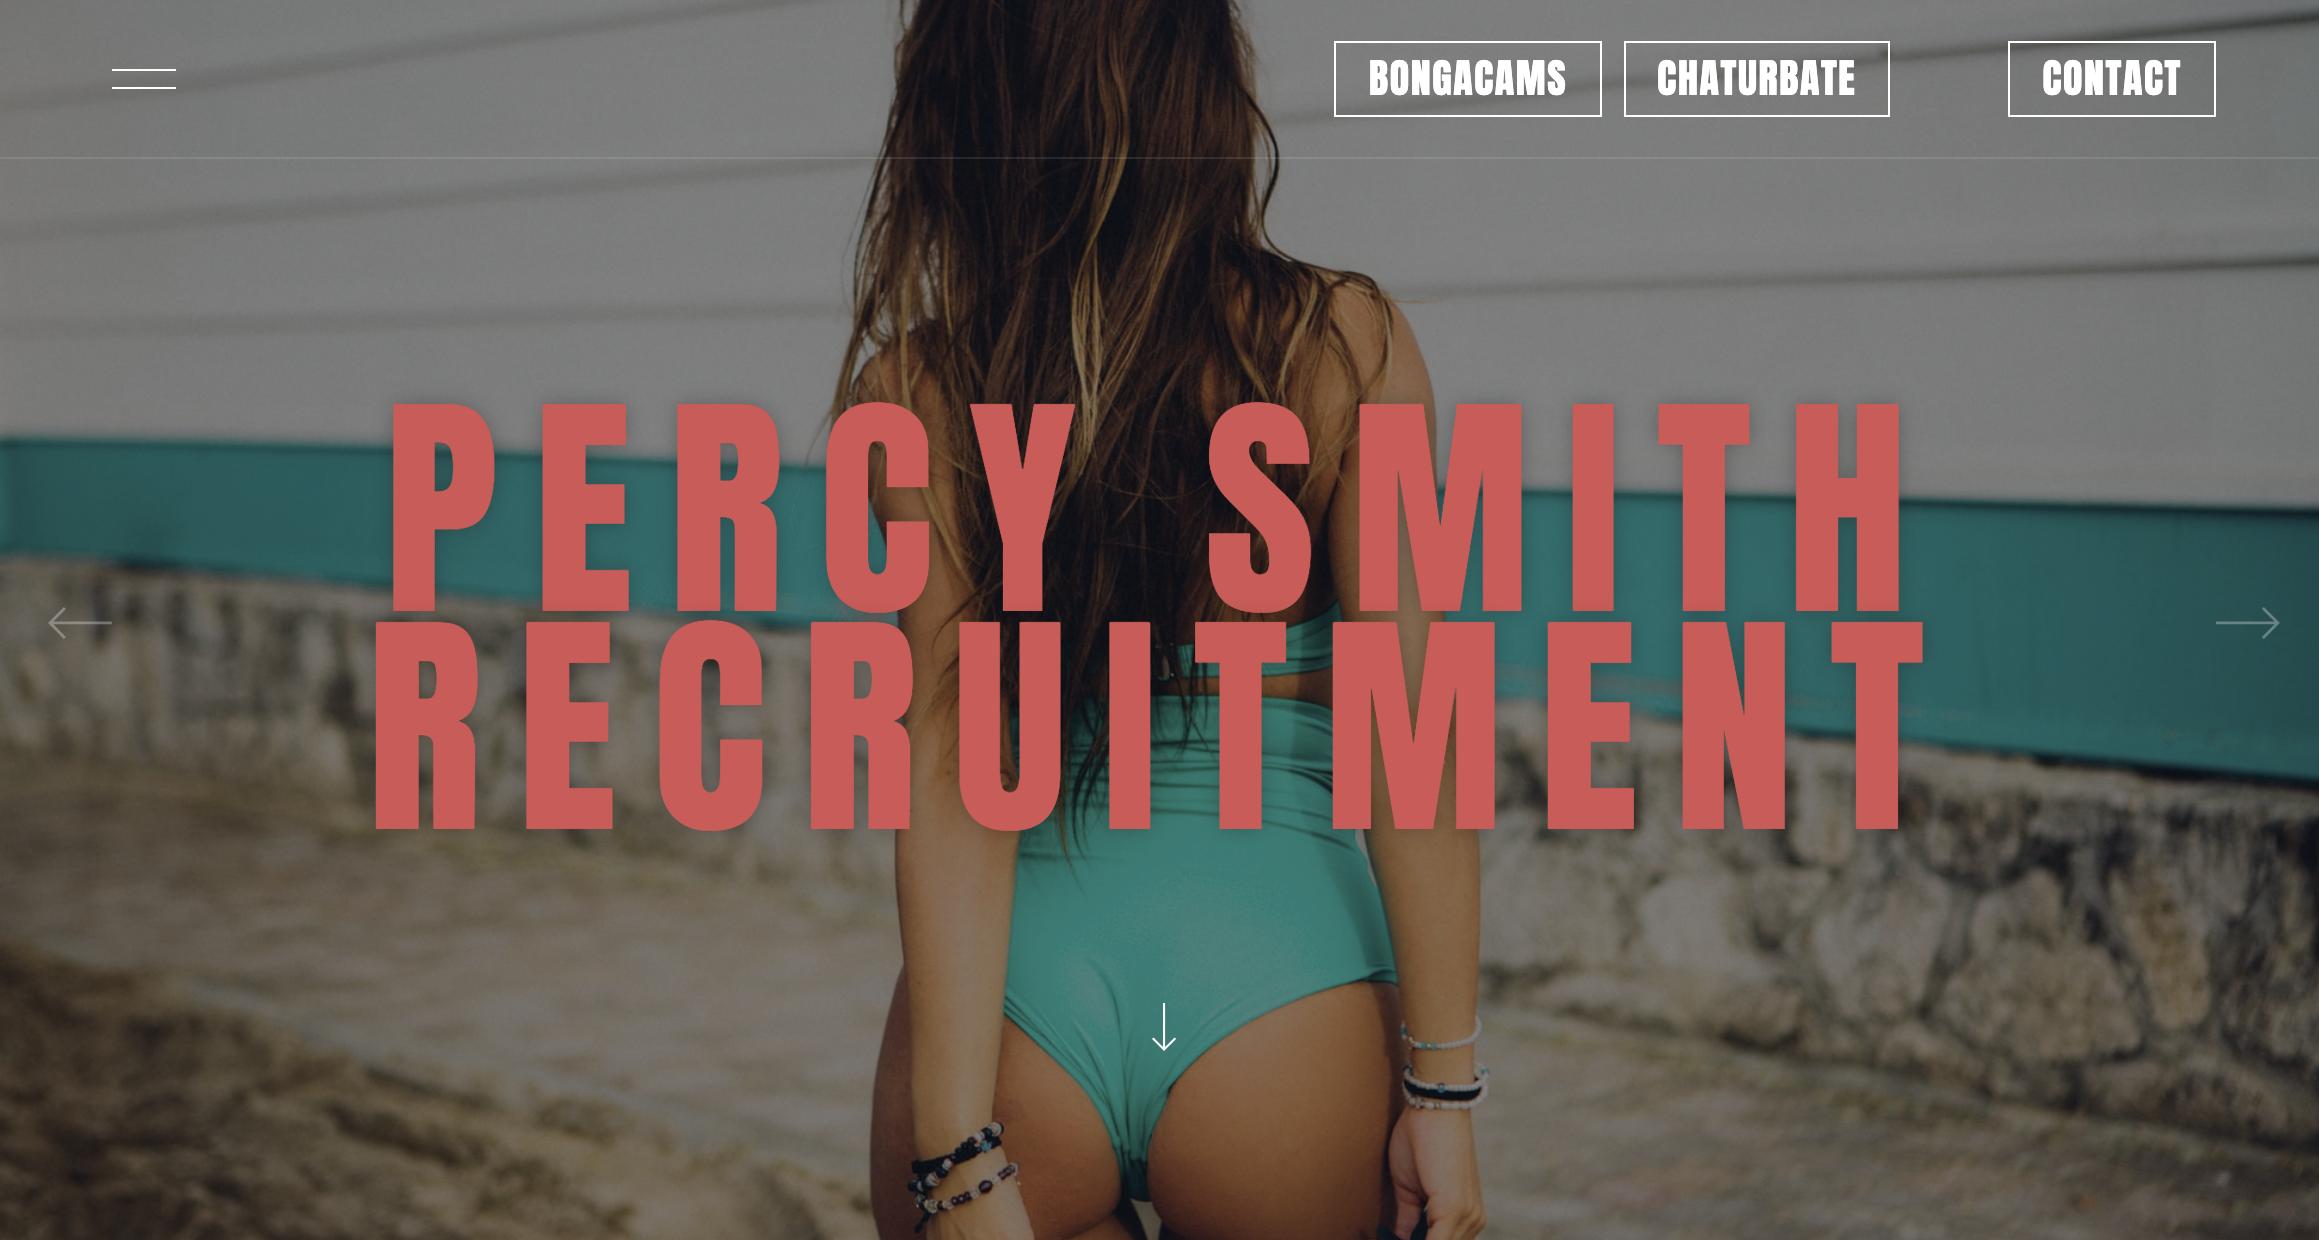 Percy Smith Recruitment